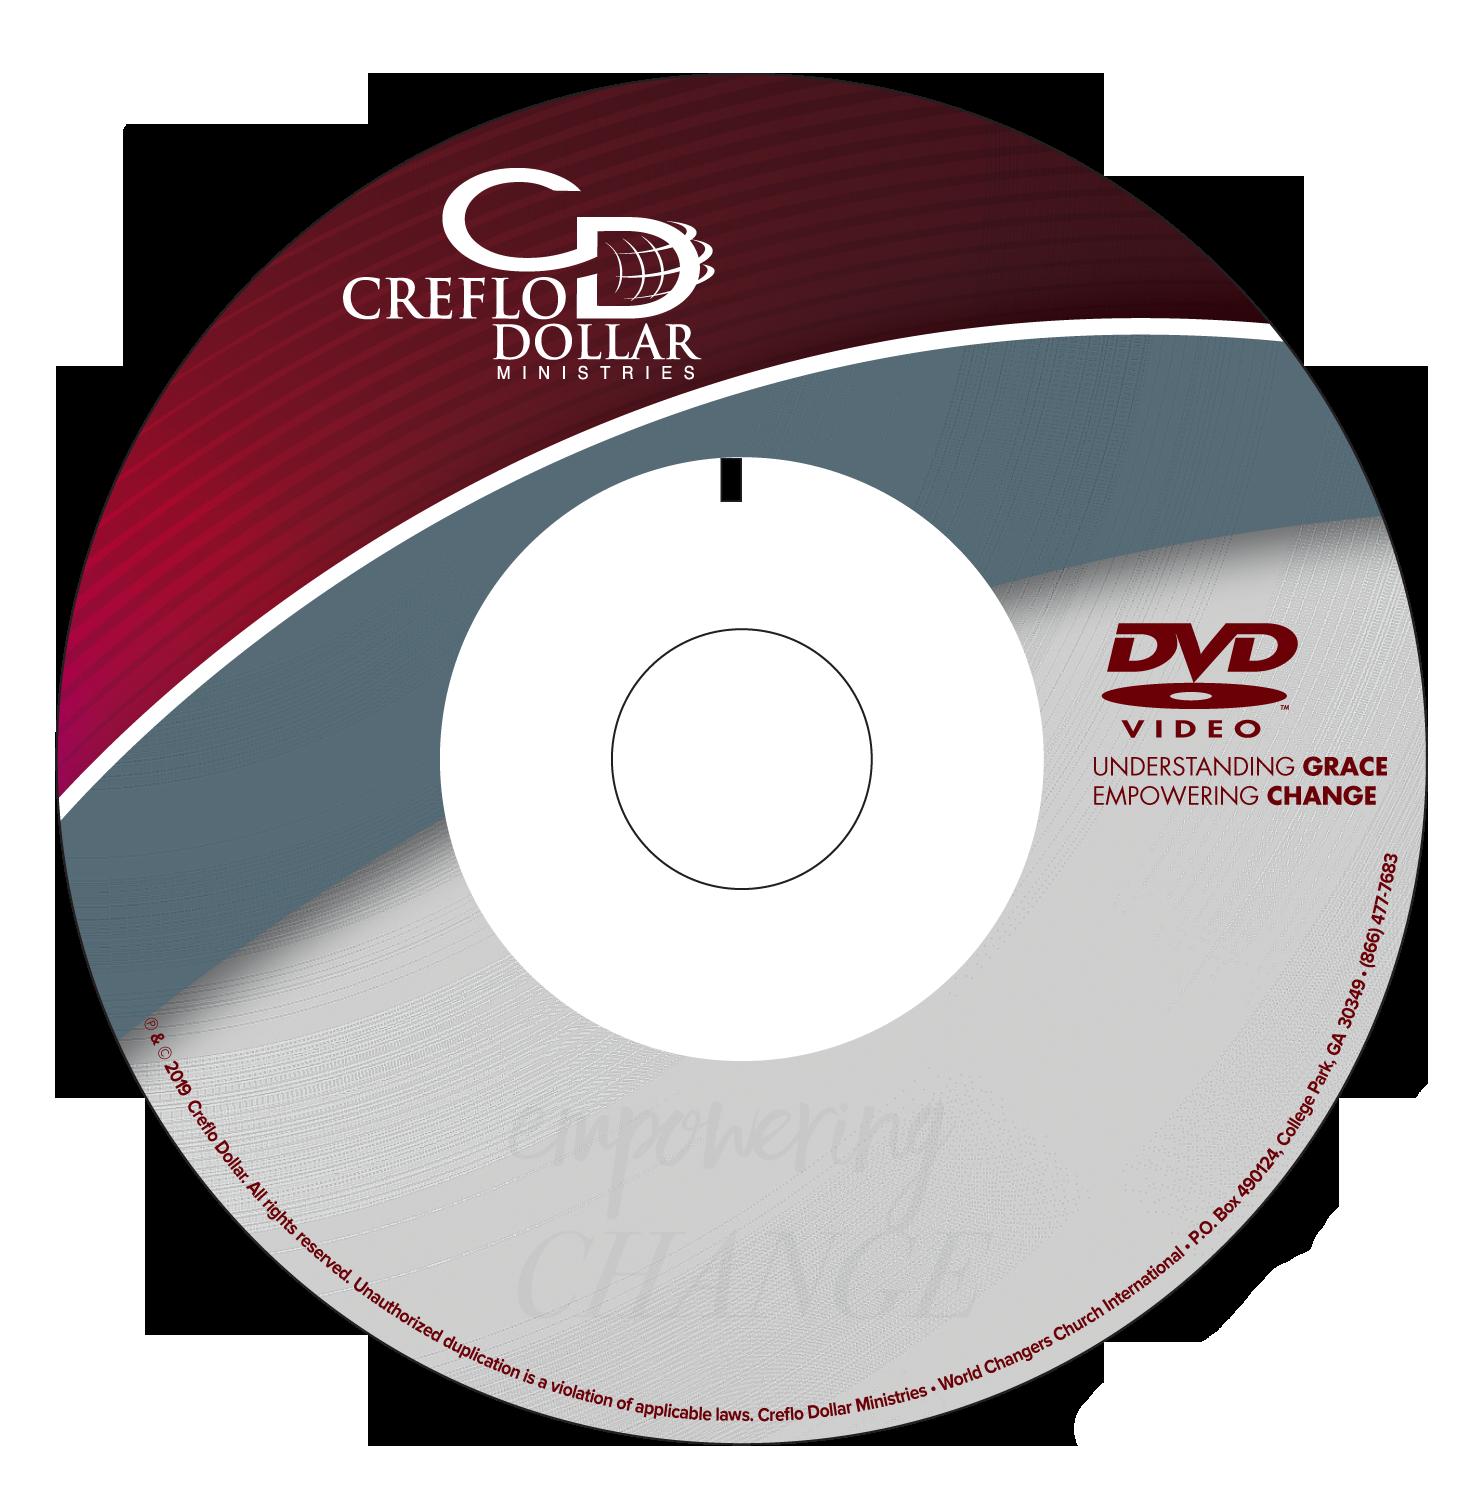 060919 Sunday Service DVD 10am